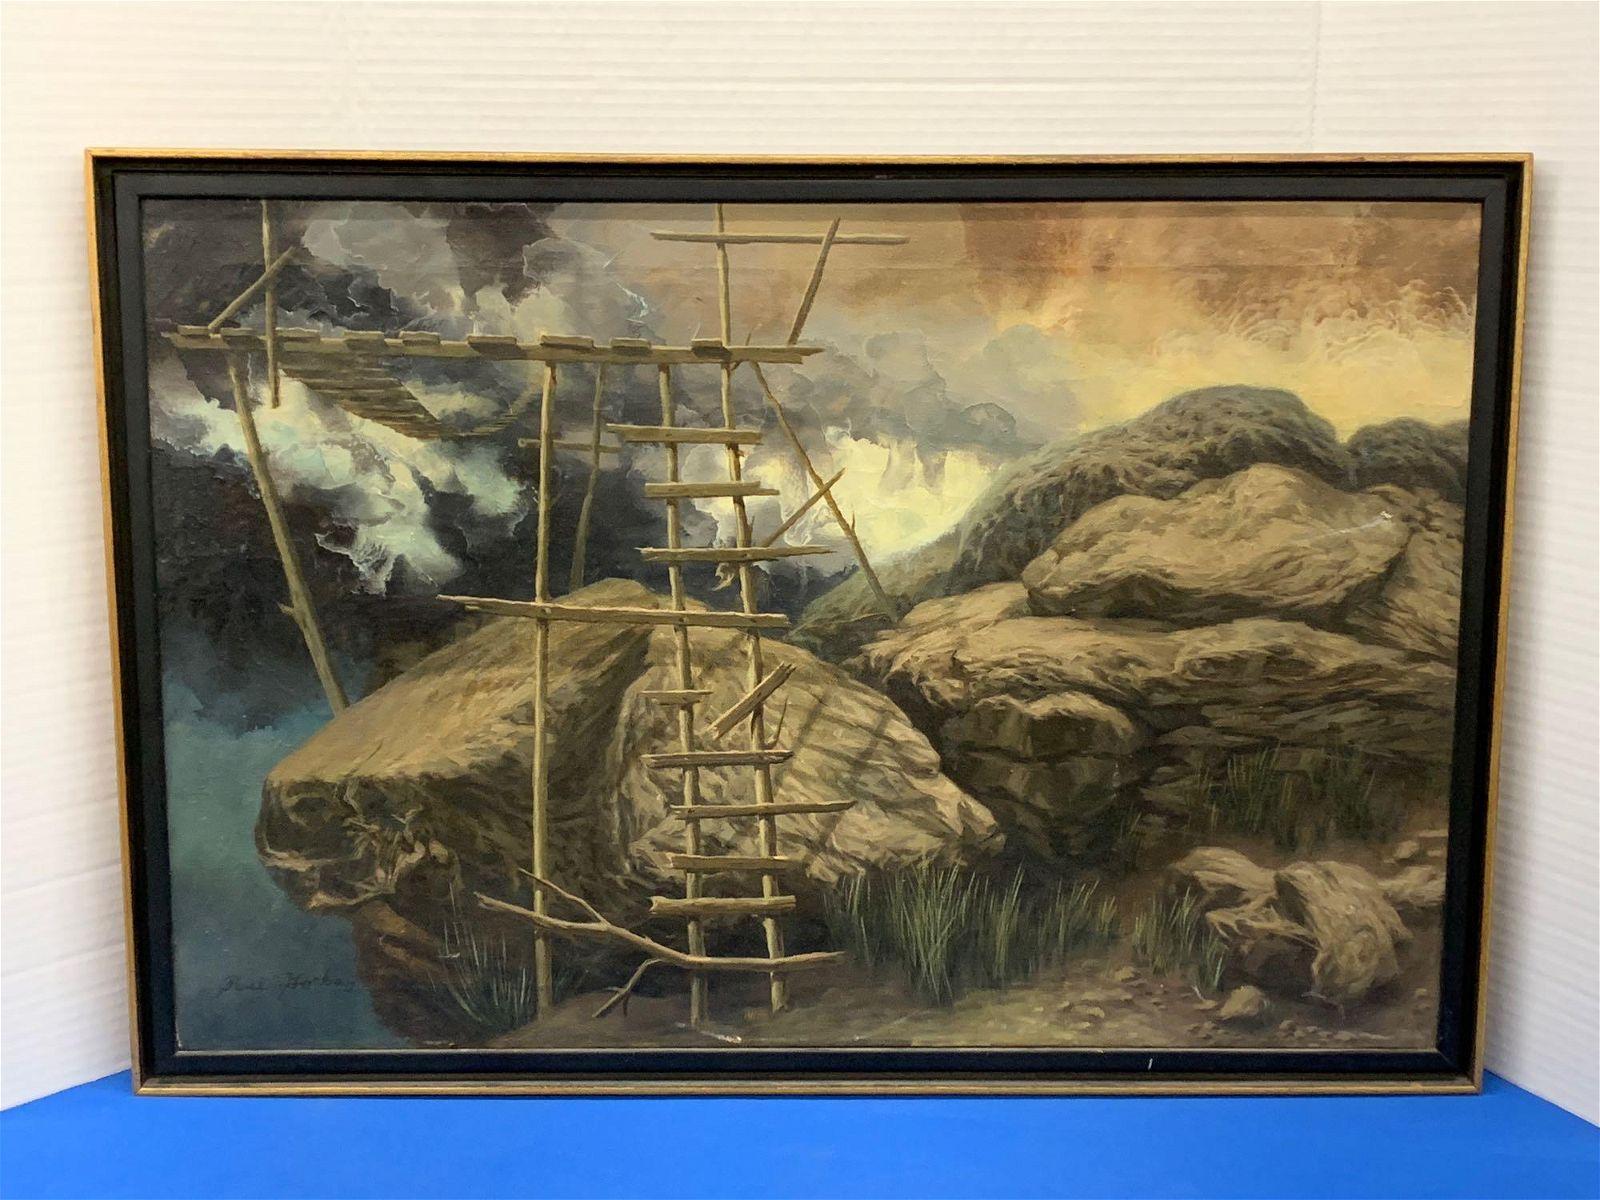 Paul Gorka. Oil on Canvas, The Ladder